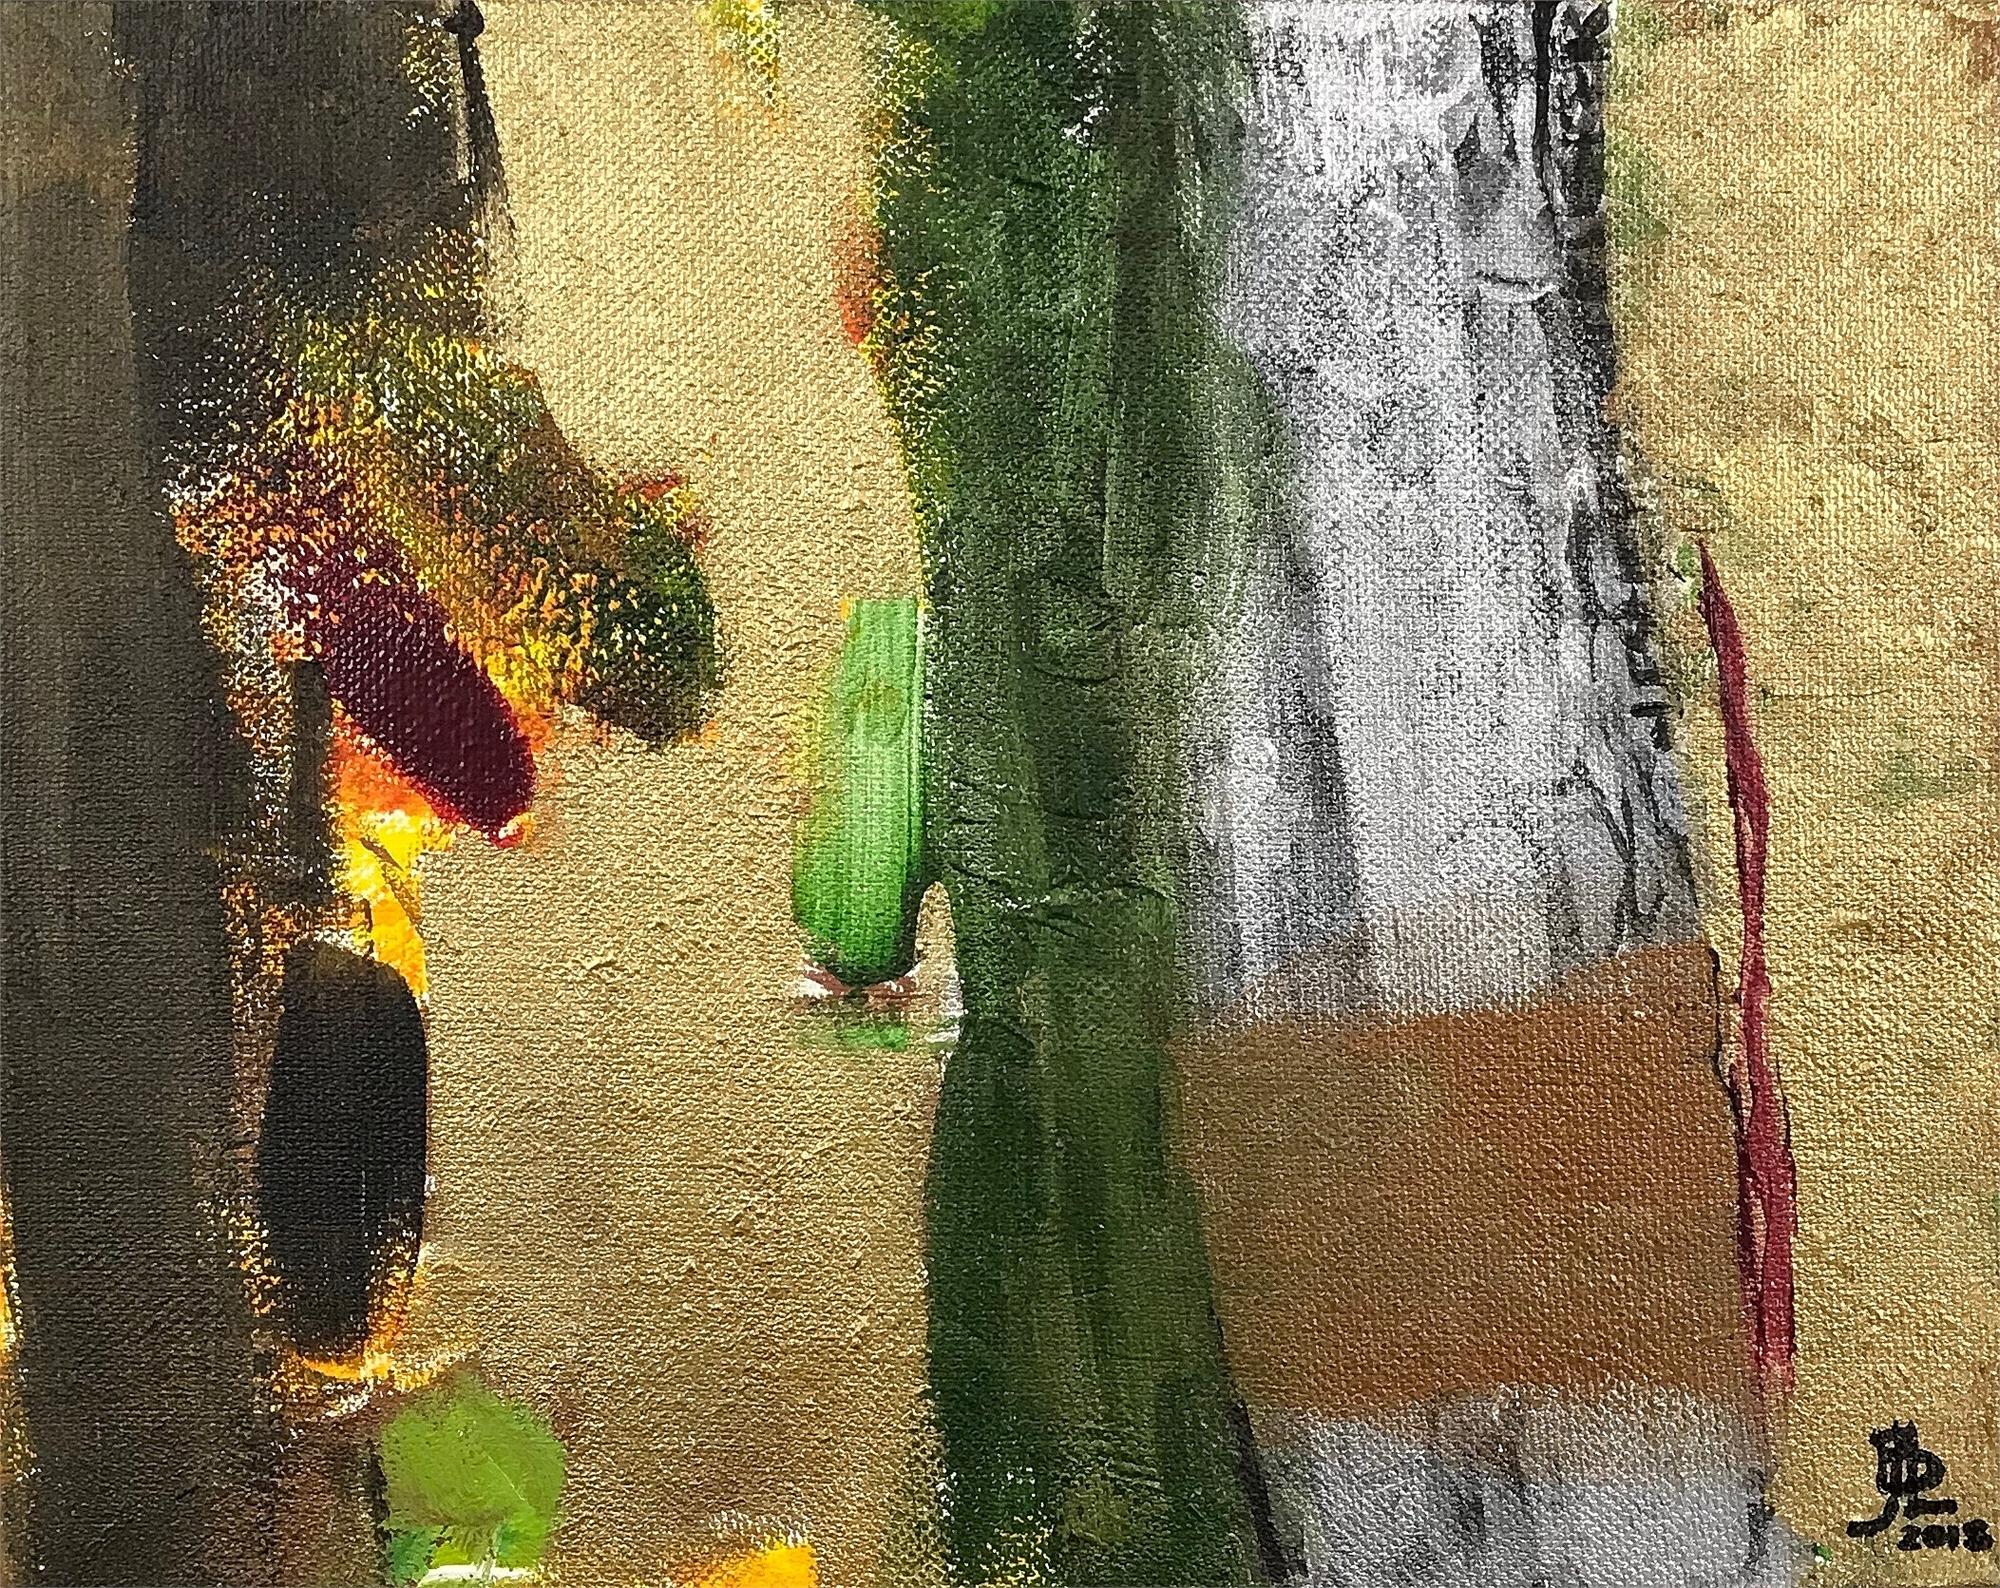 Woods by Leslie Poteet Busker